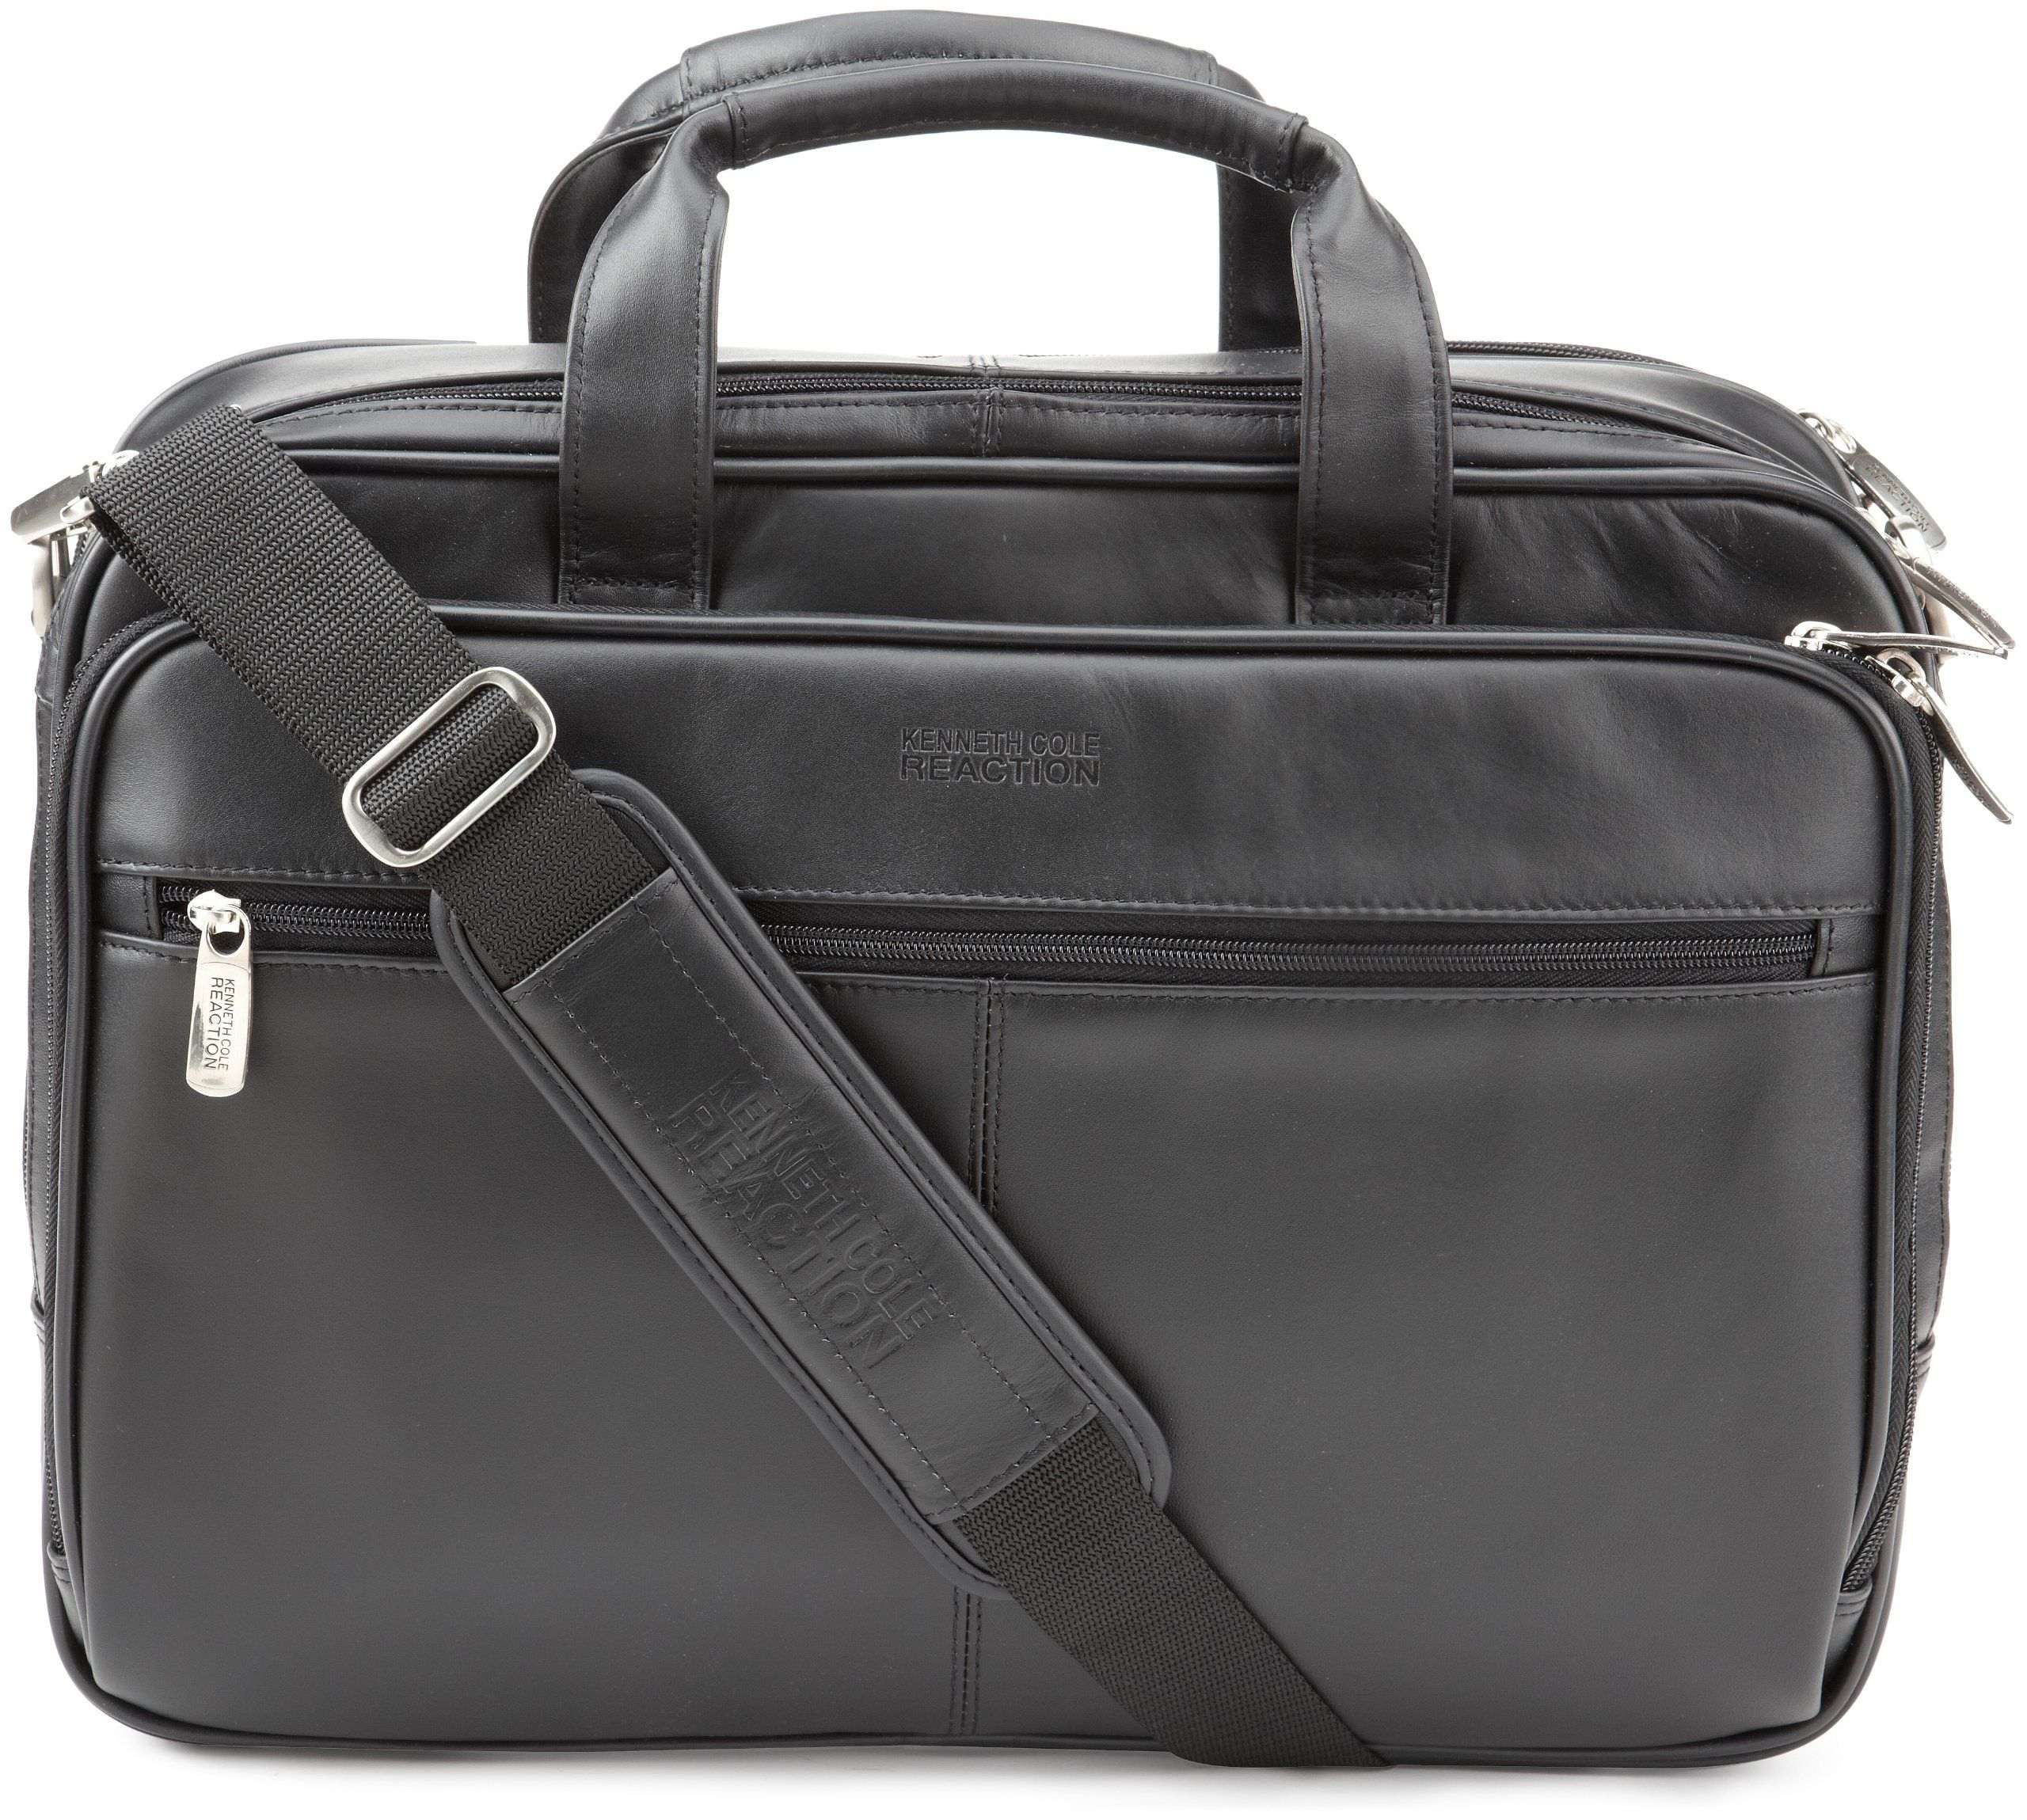 5303afe7bec1 Dad_Amazon.com: Kenneth Cole Reaction Luggage , I Rest My Case, Black, One  Size: Clothing